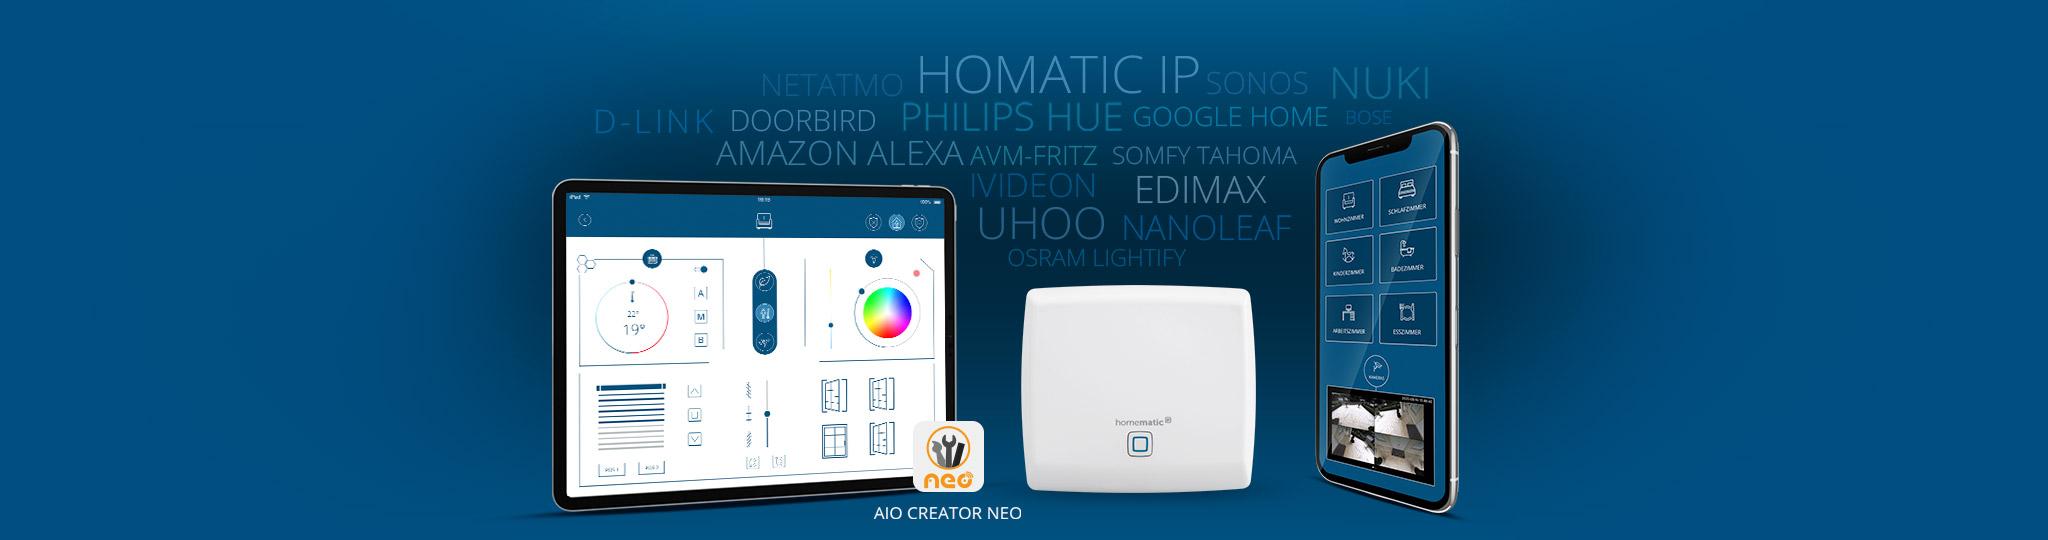 homematic ip access point mit aio creator neo - smart home mit mediola